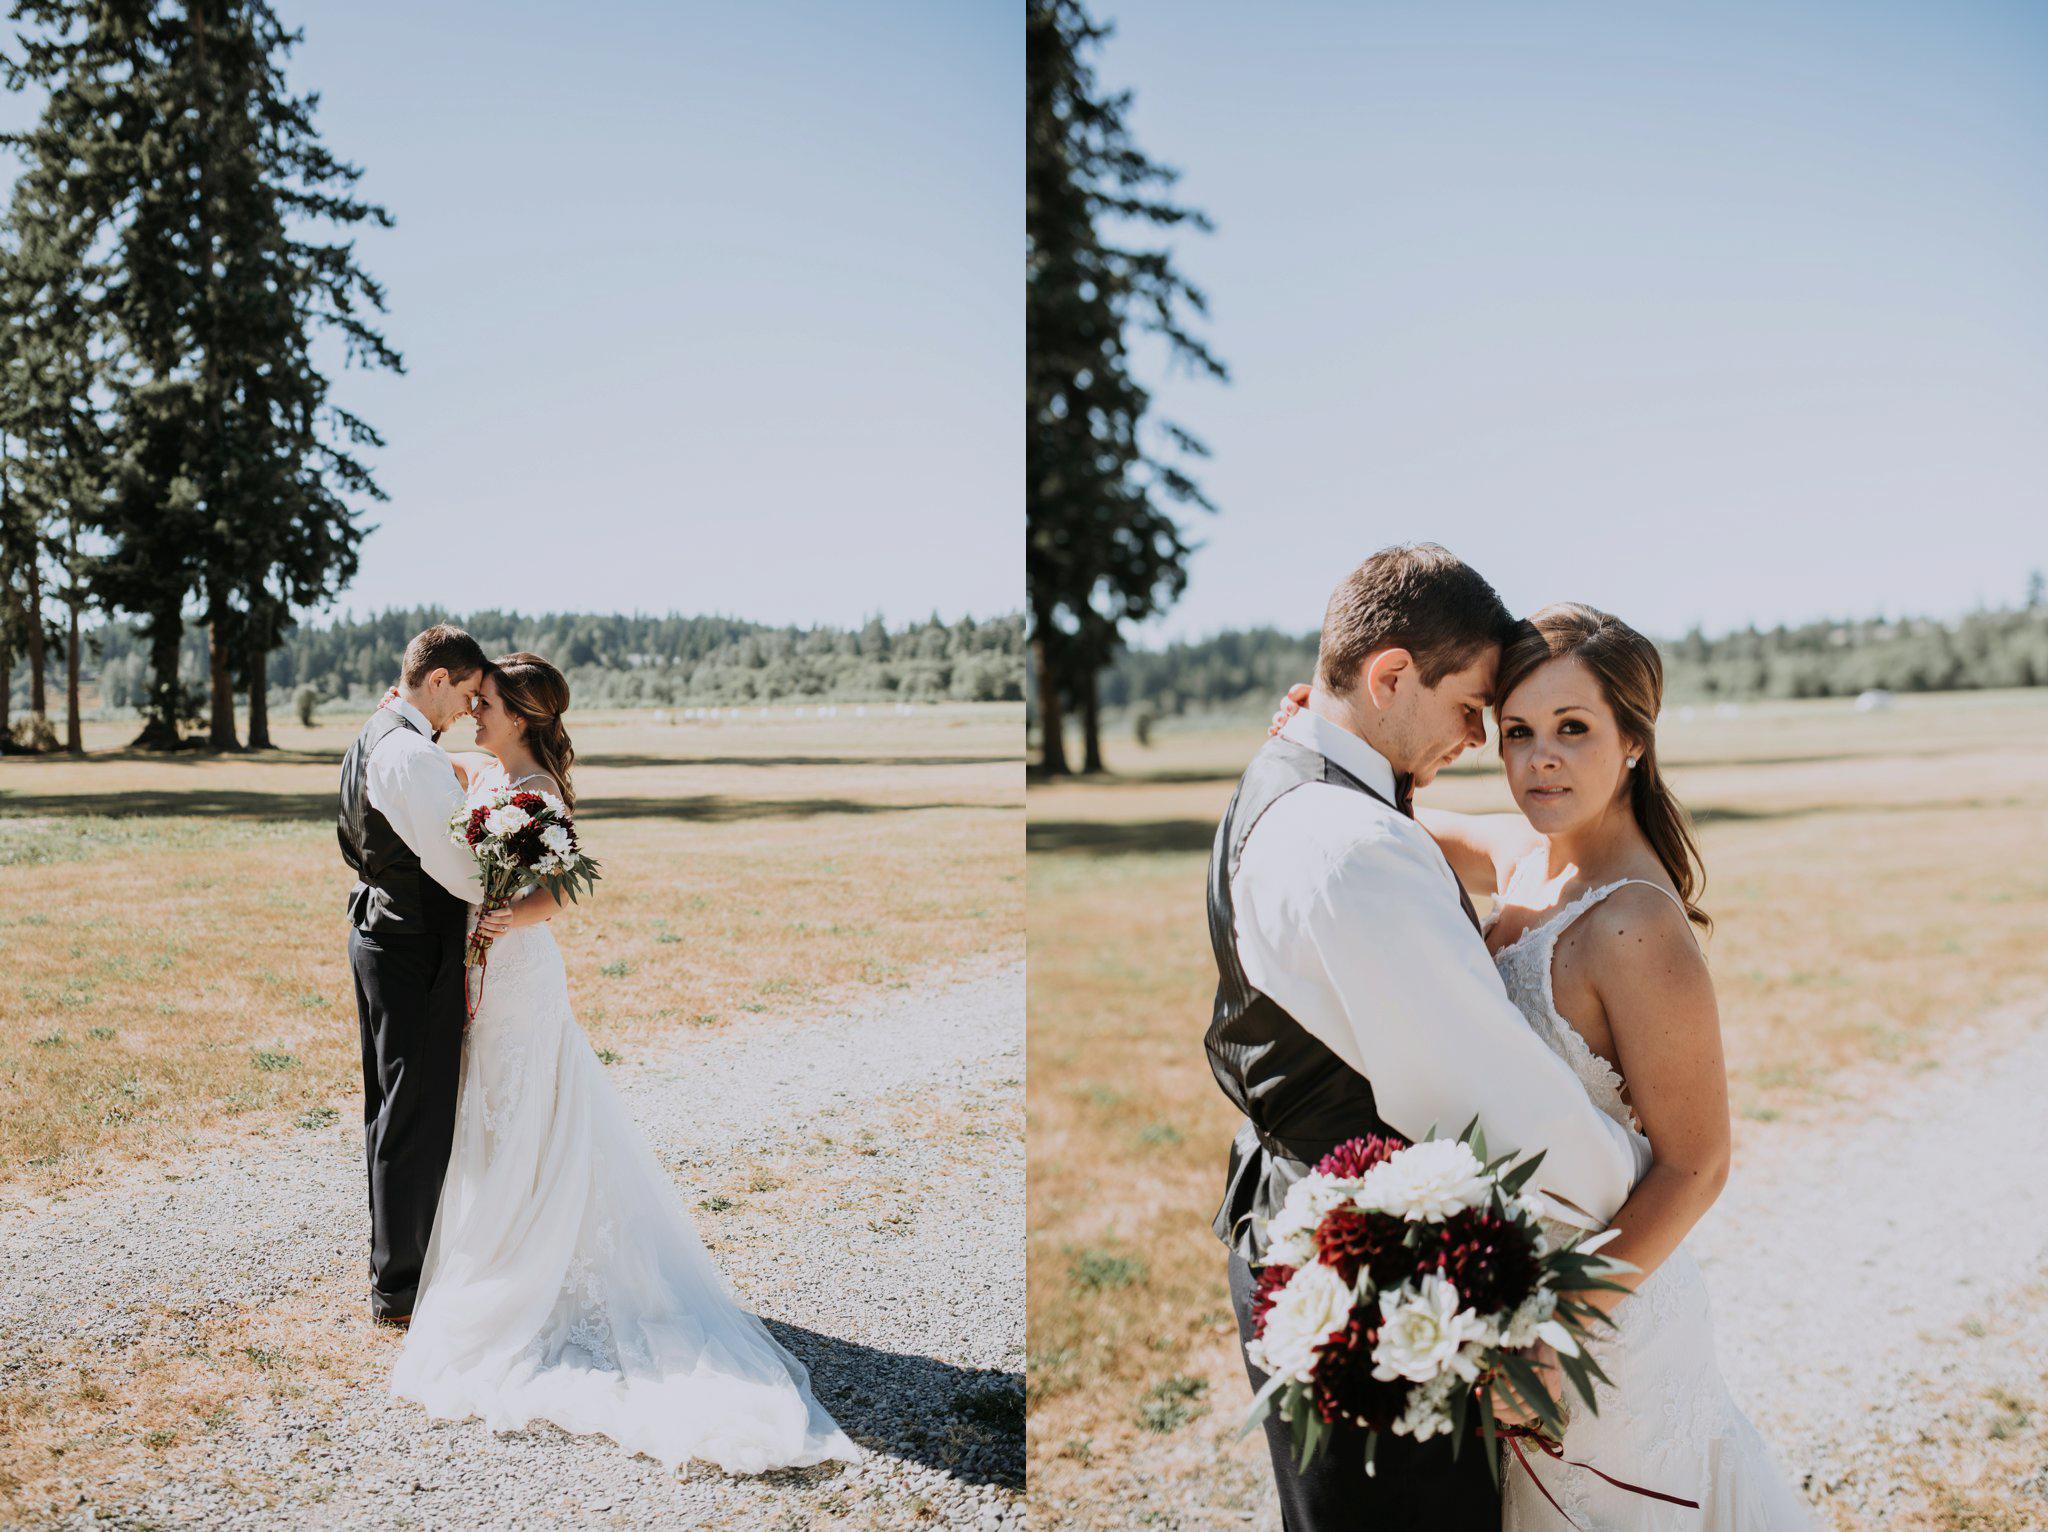 kristen-and-cody-the-kelley-farm-wedding-seattle-photographer-caitlyn-nikula-44.jpg